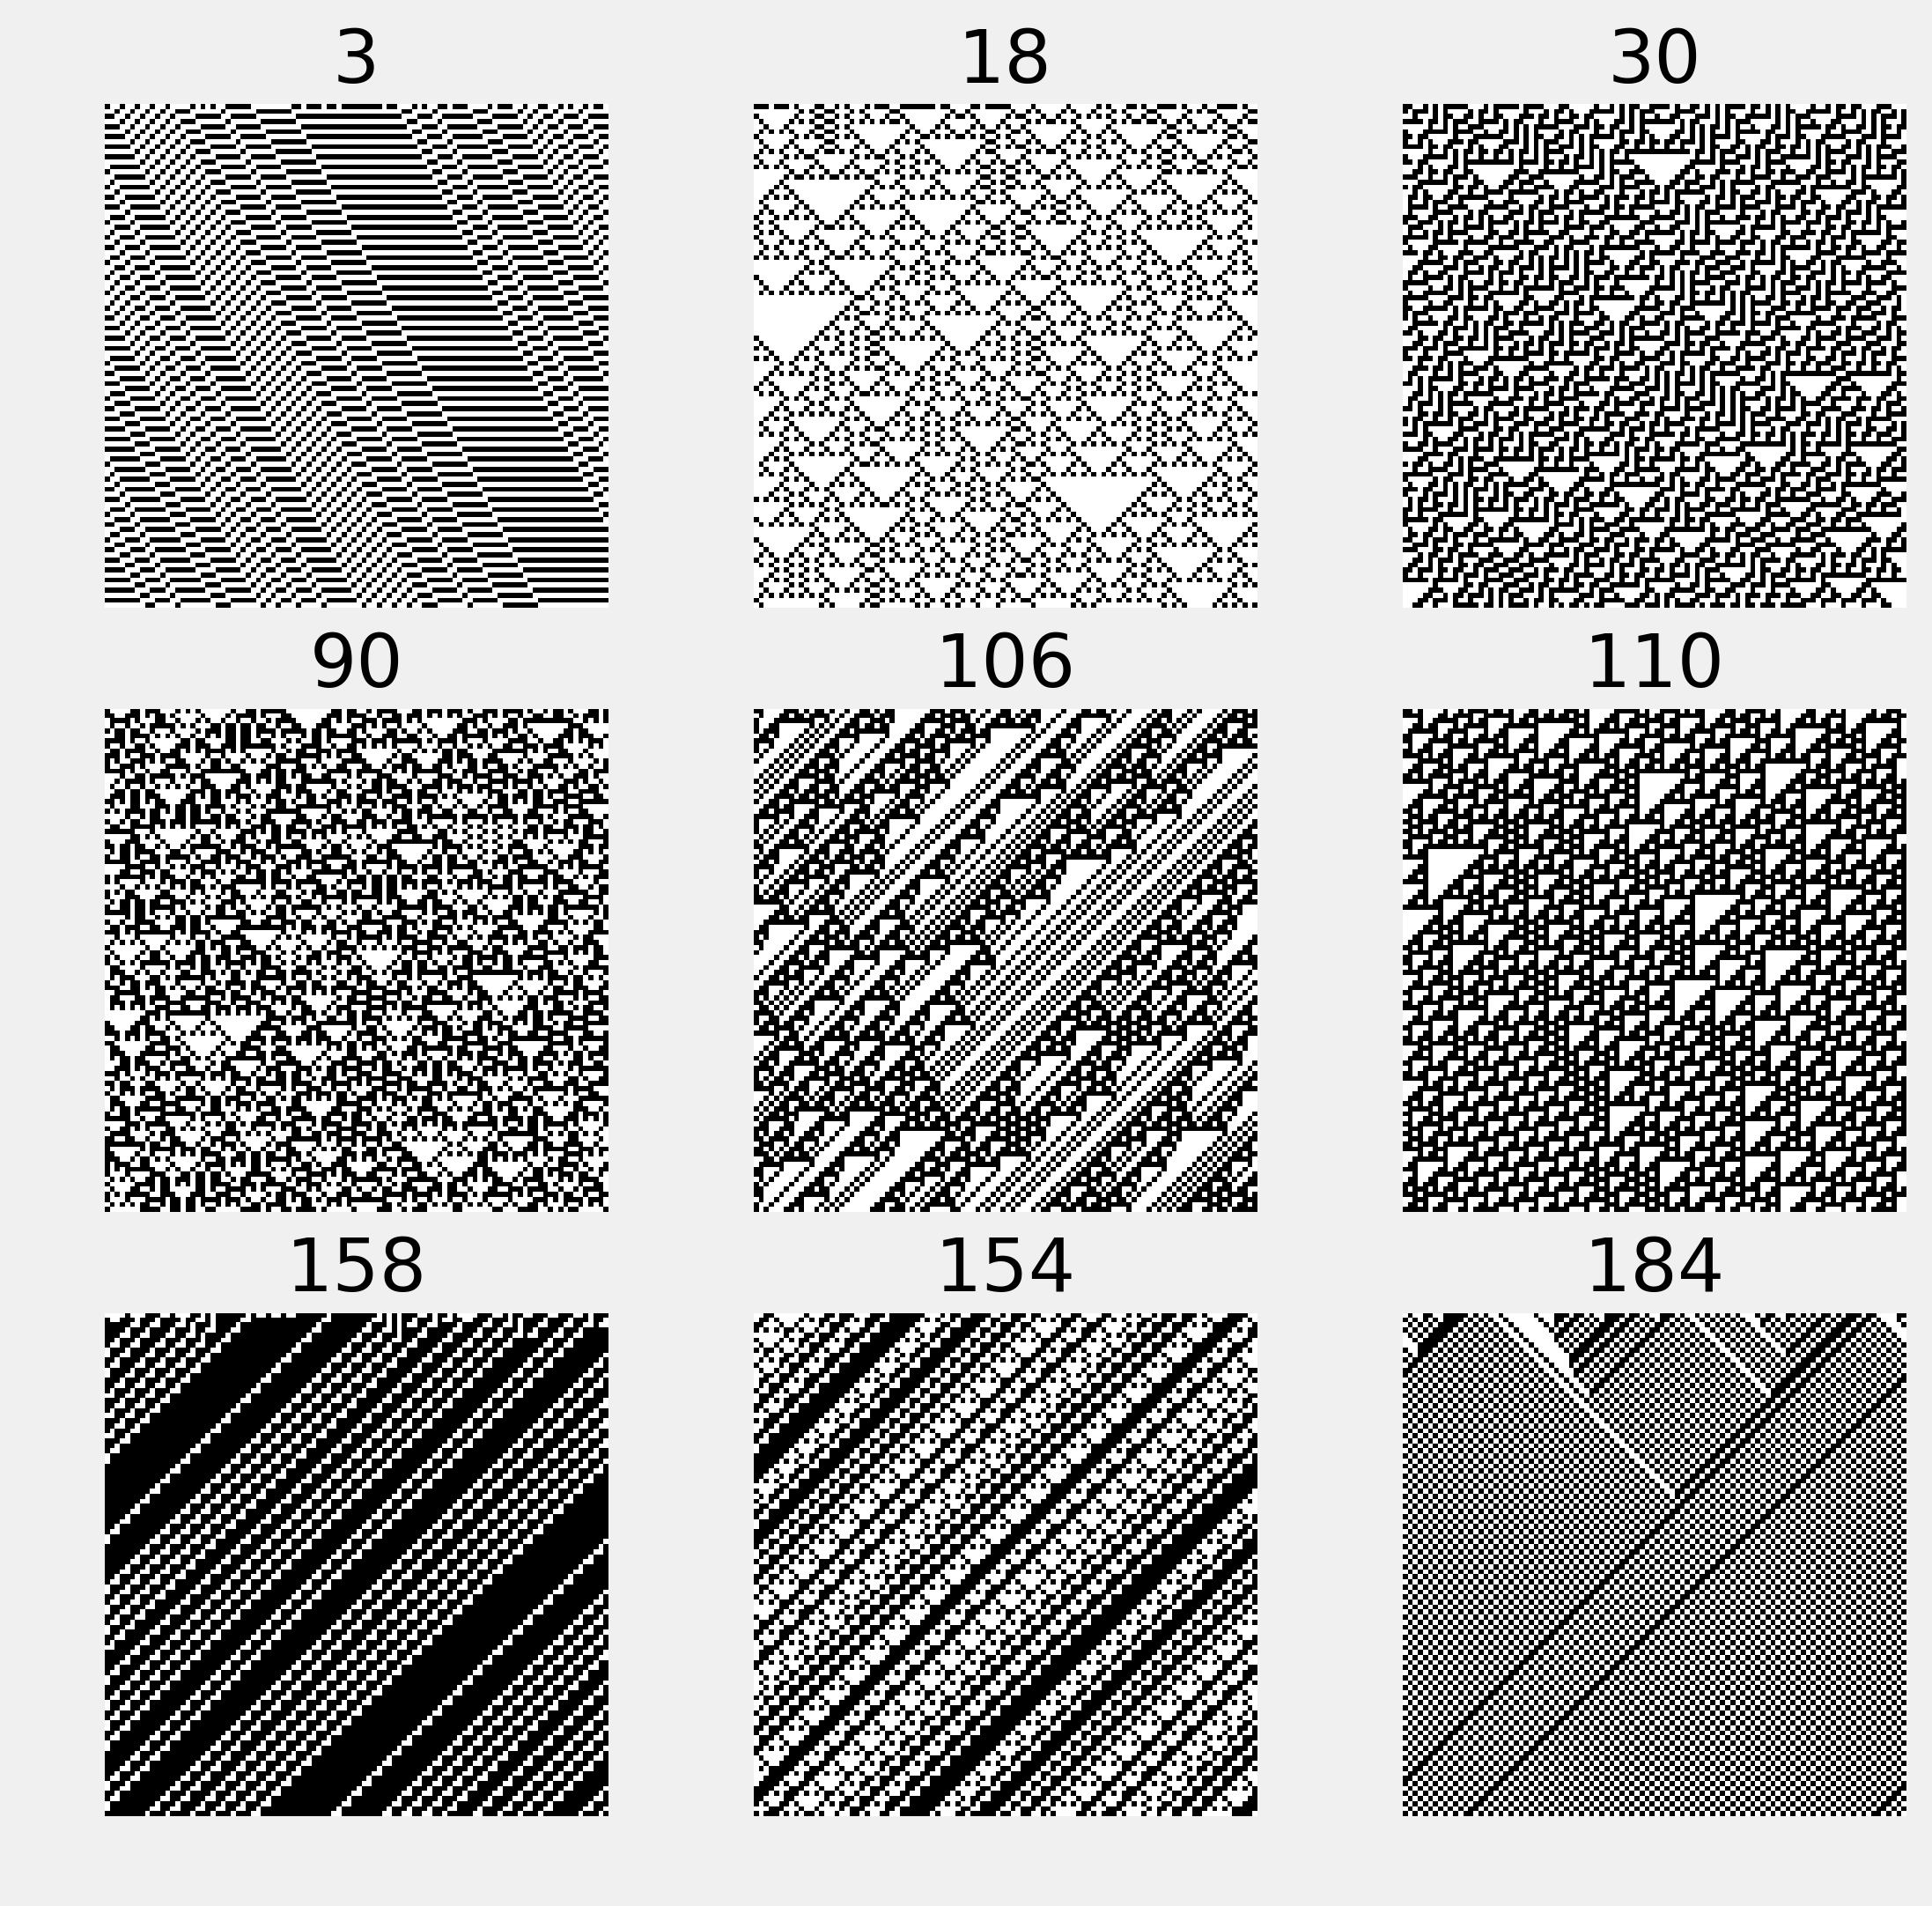 <matplotlib.figure.Figure at 0x72ade48>